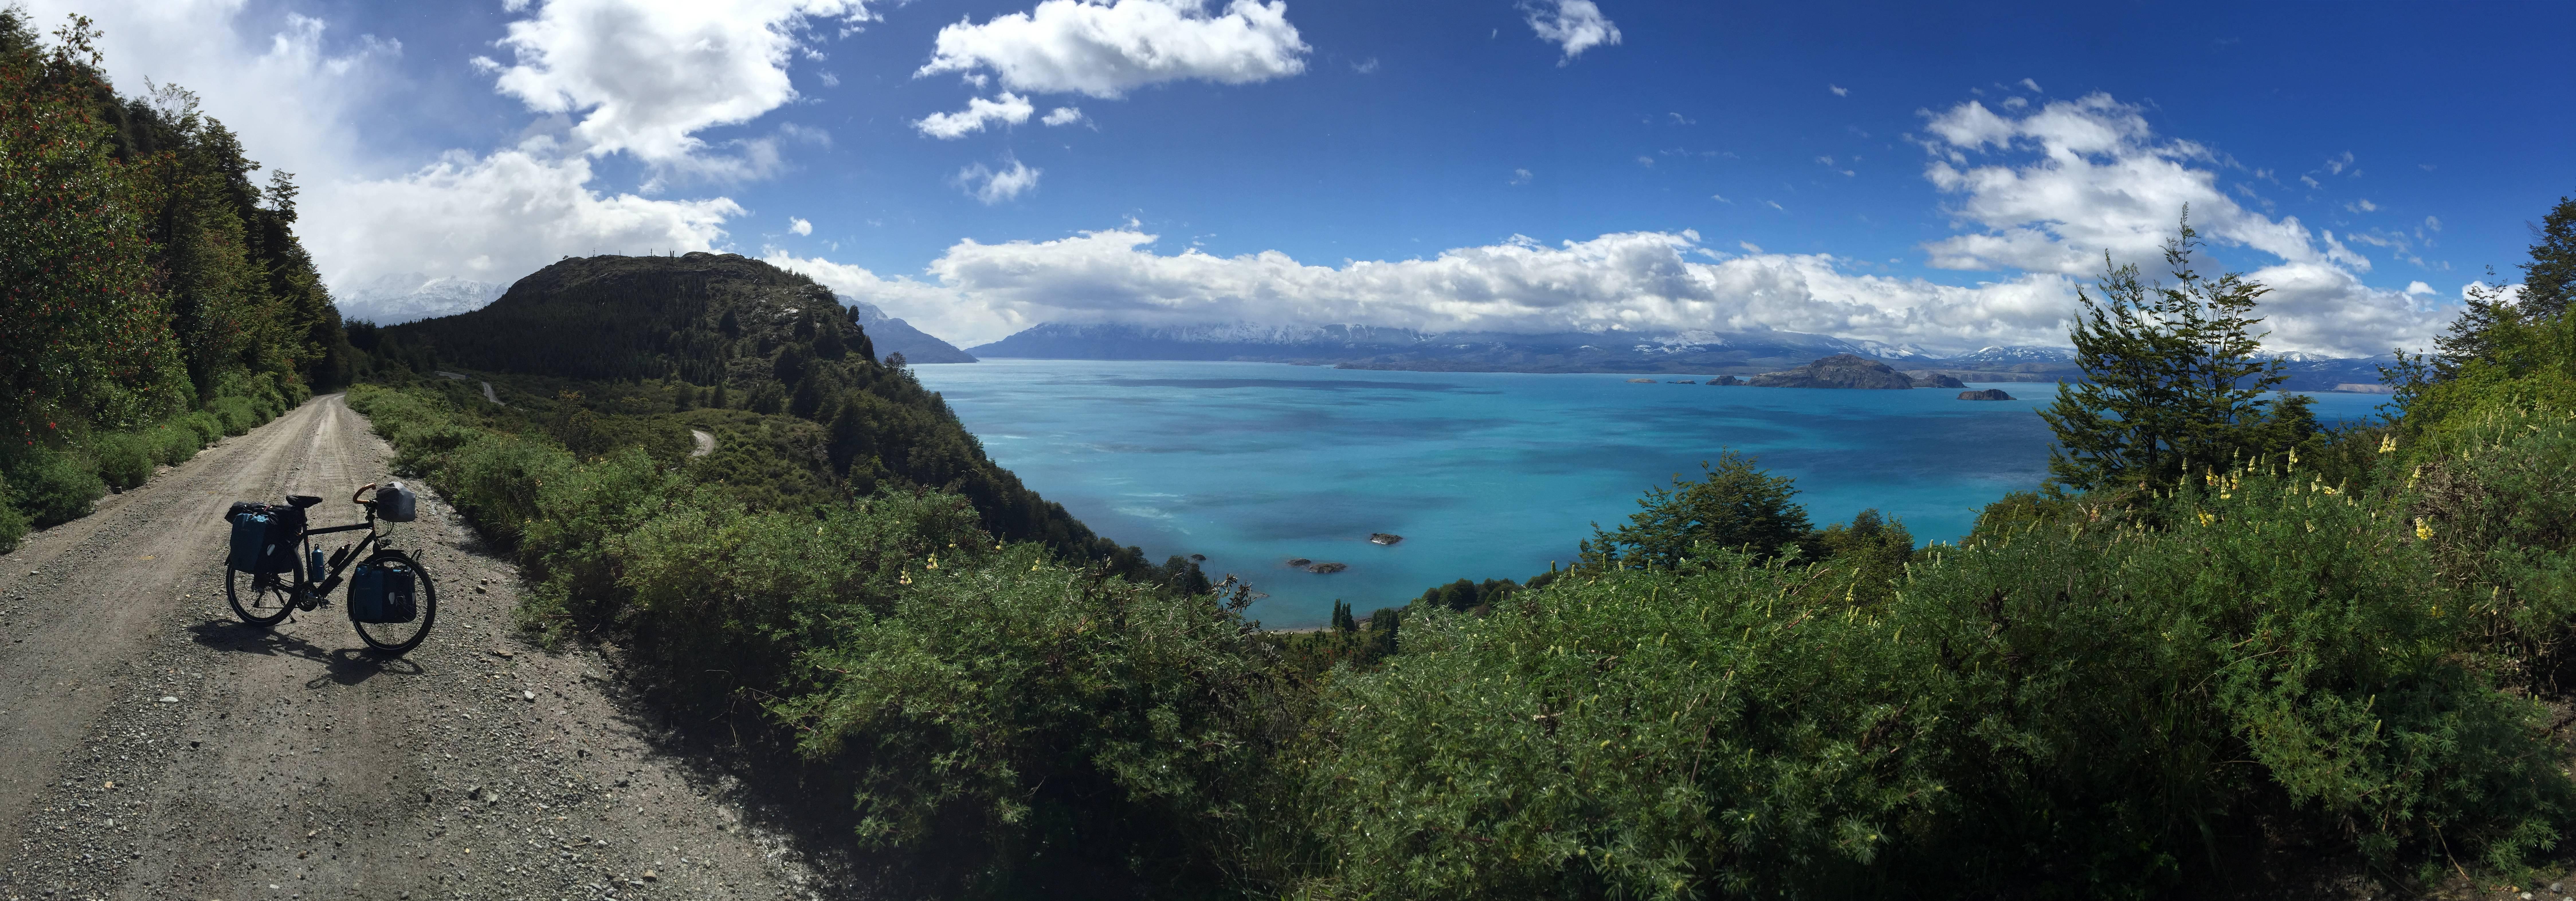 Photo 2: Lago General Carrera, l'eau turquoise de Bora Bora 30° en moins